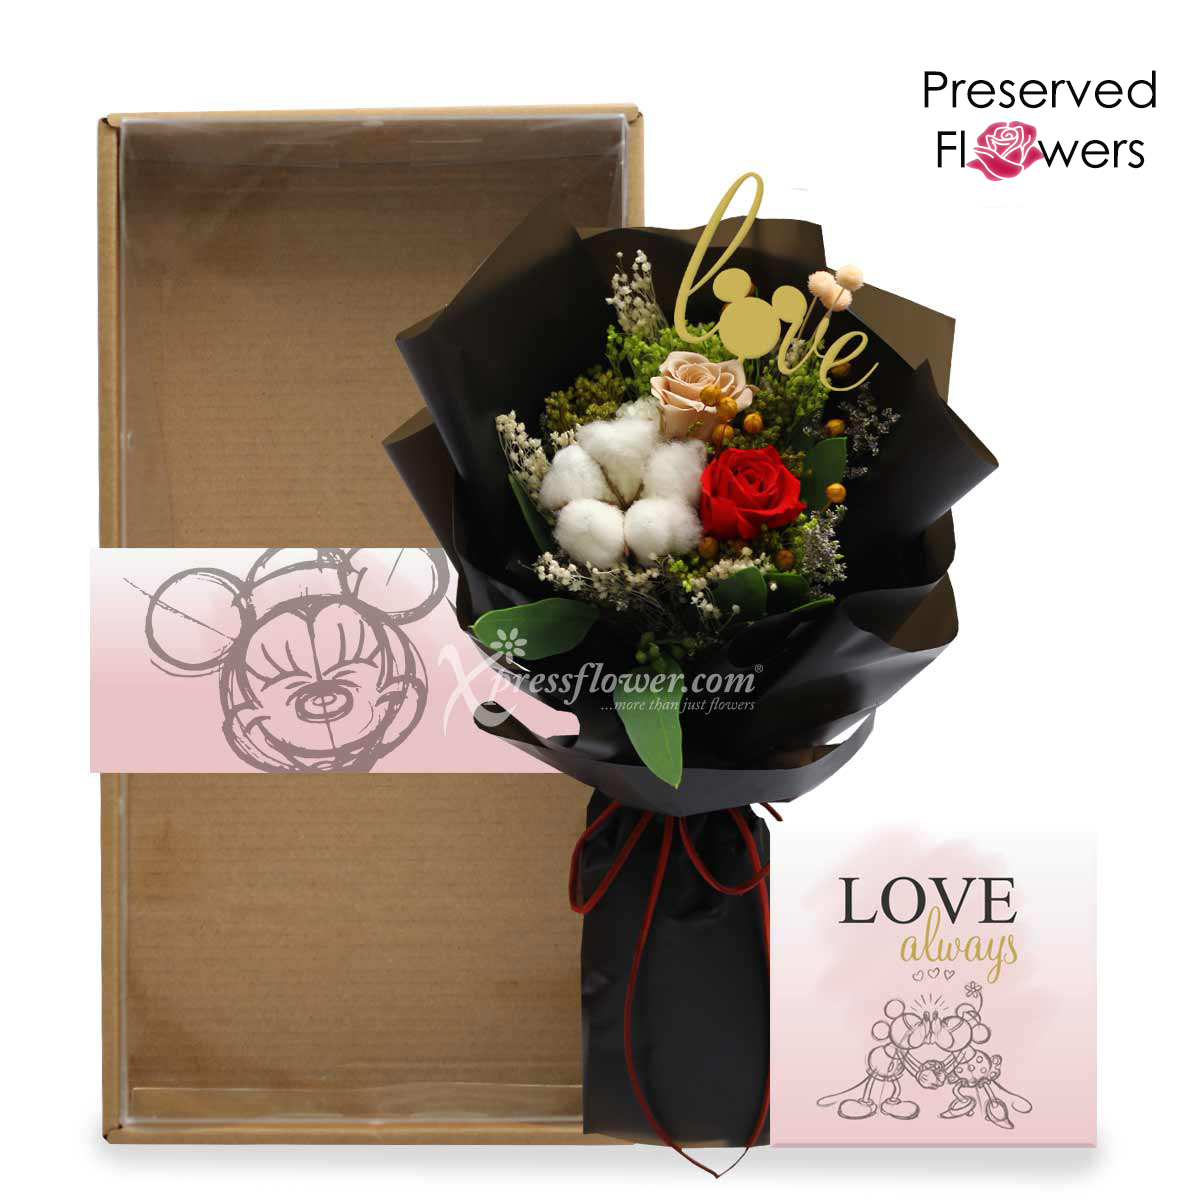 Eternally in My Heart (Preserved Flowers)